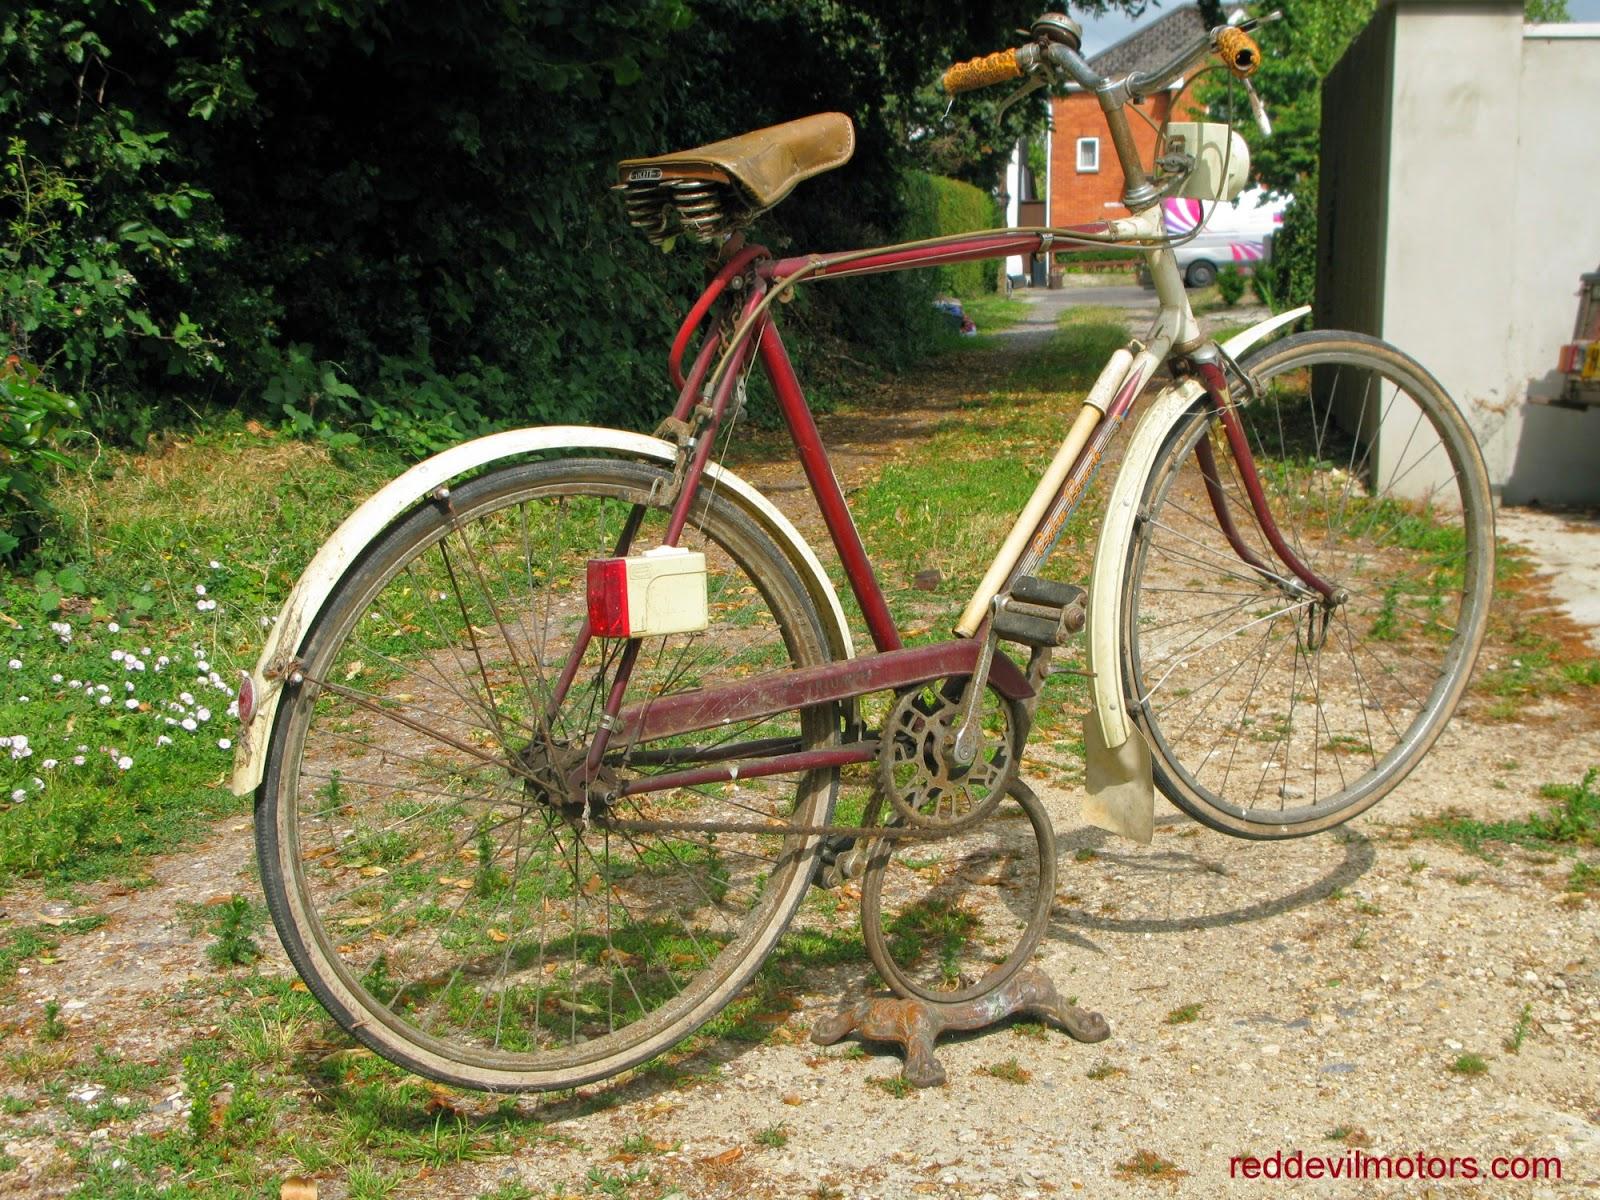 Red Devil Motors Triumph Palm Beach Bicycle